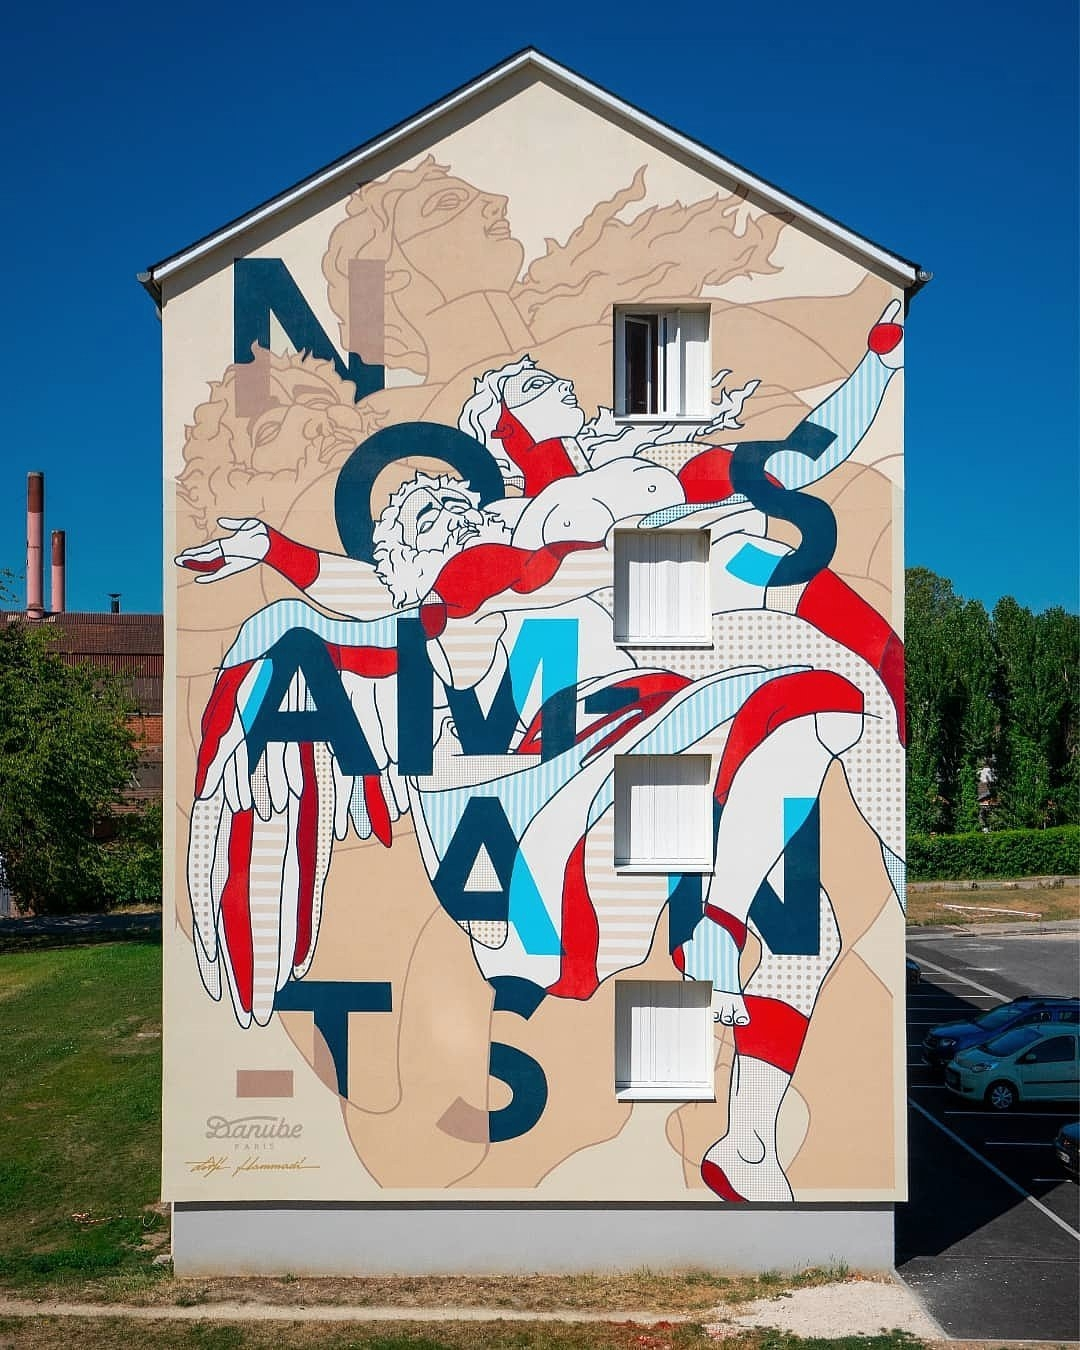 Danube Paris + Lekilibrist @ Les Andelys, France